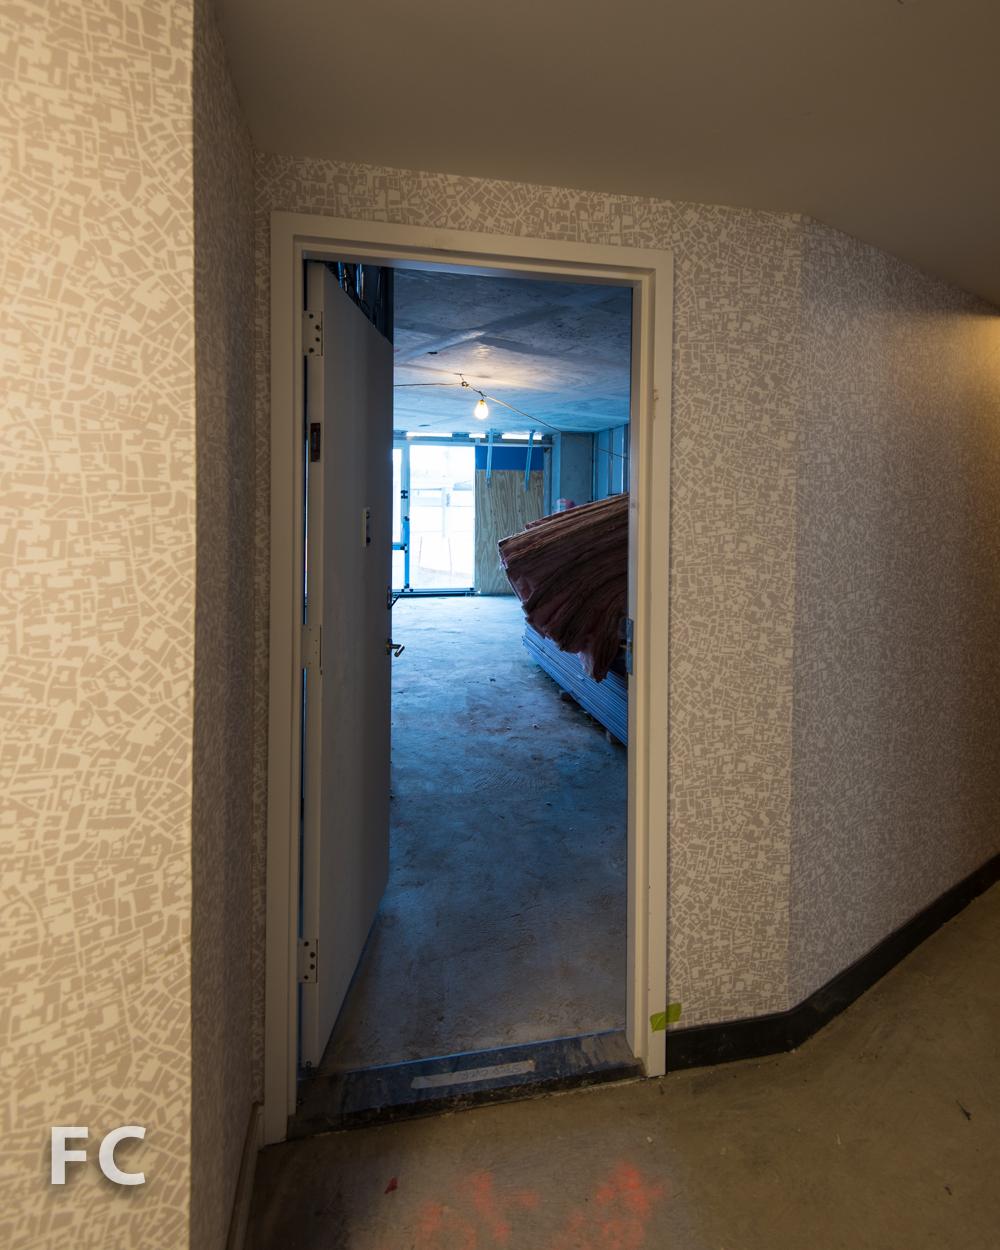 Typical residential corridormockup.